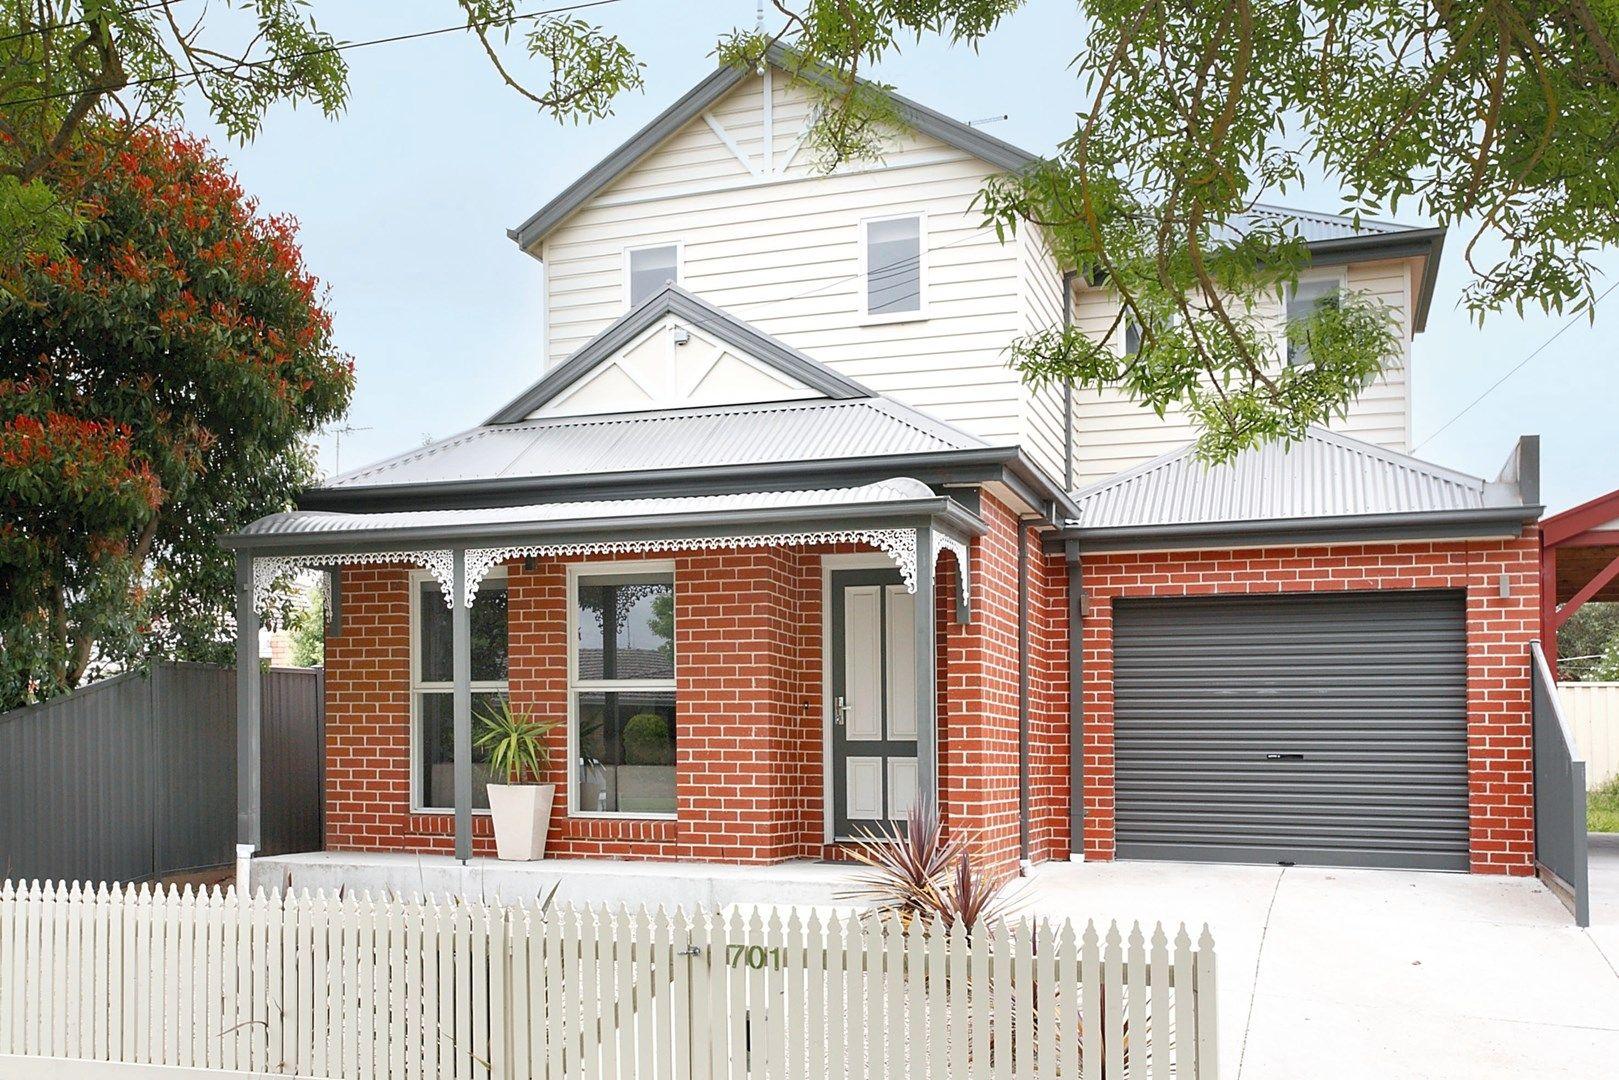 701 Urquhart Street, Ballarat Central VIC 3350, Image 0